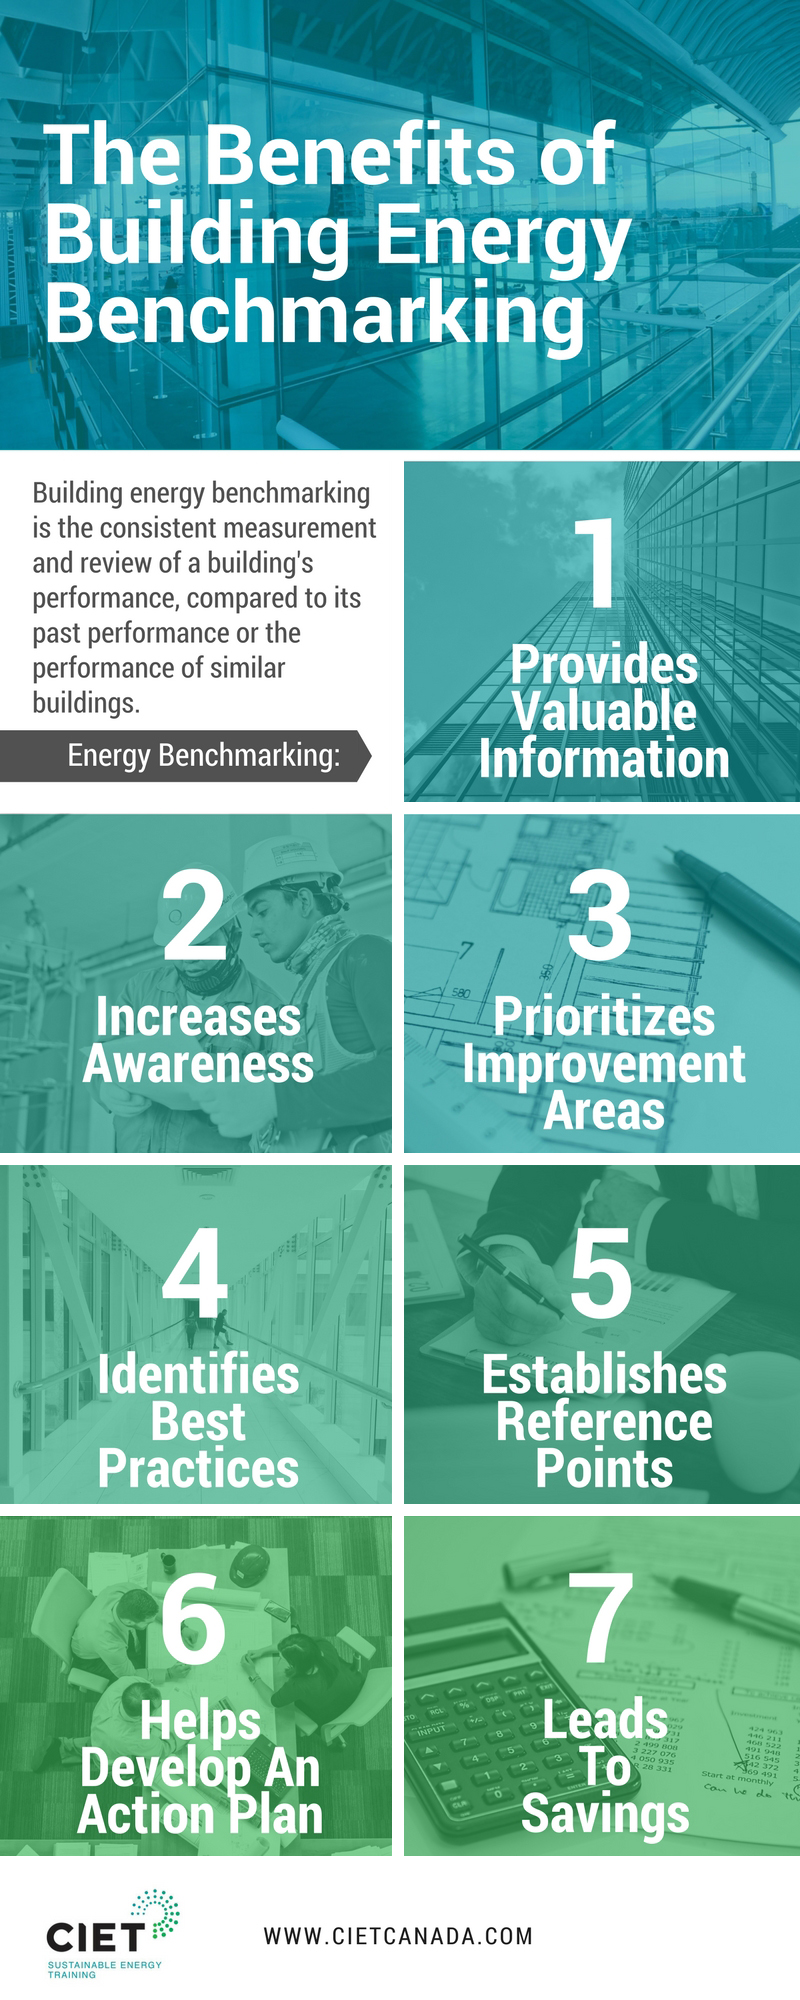 Benchmarking Building Energy Use